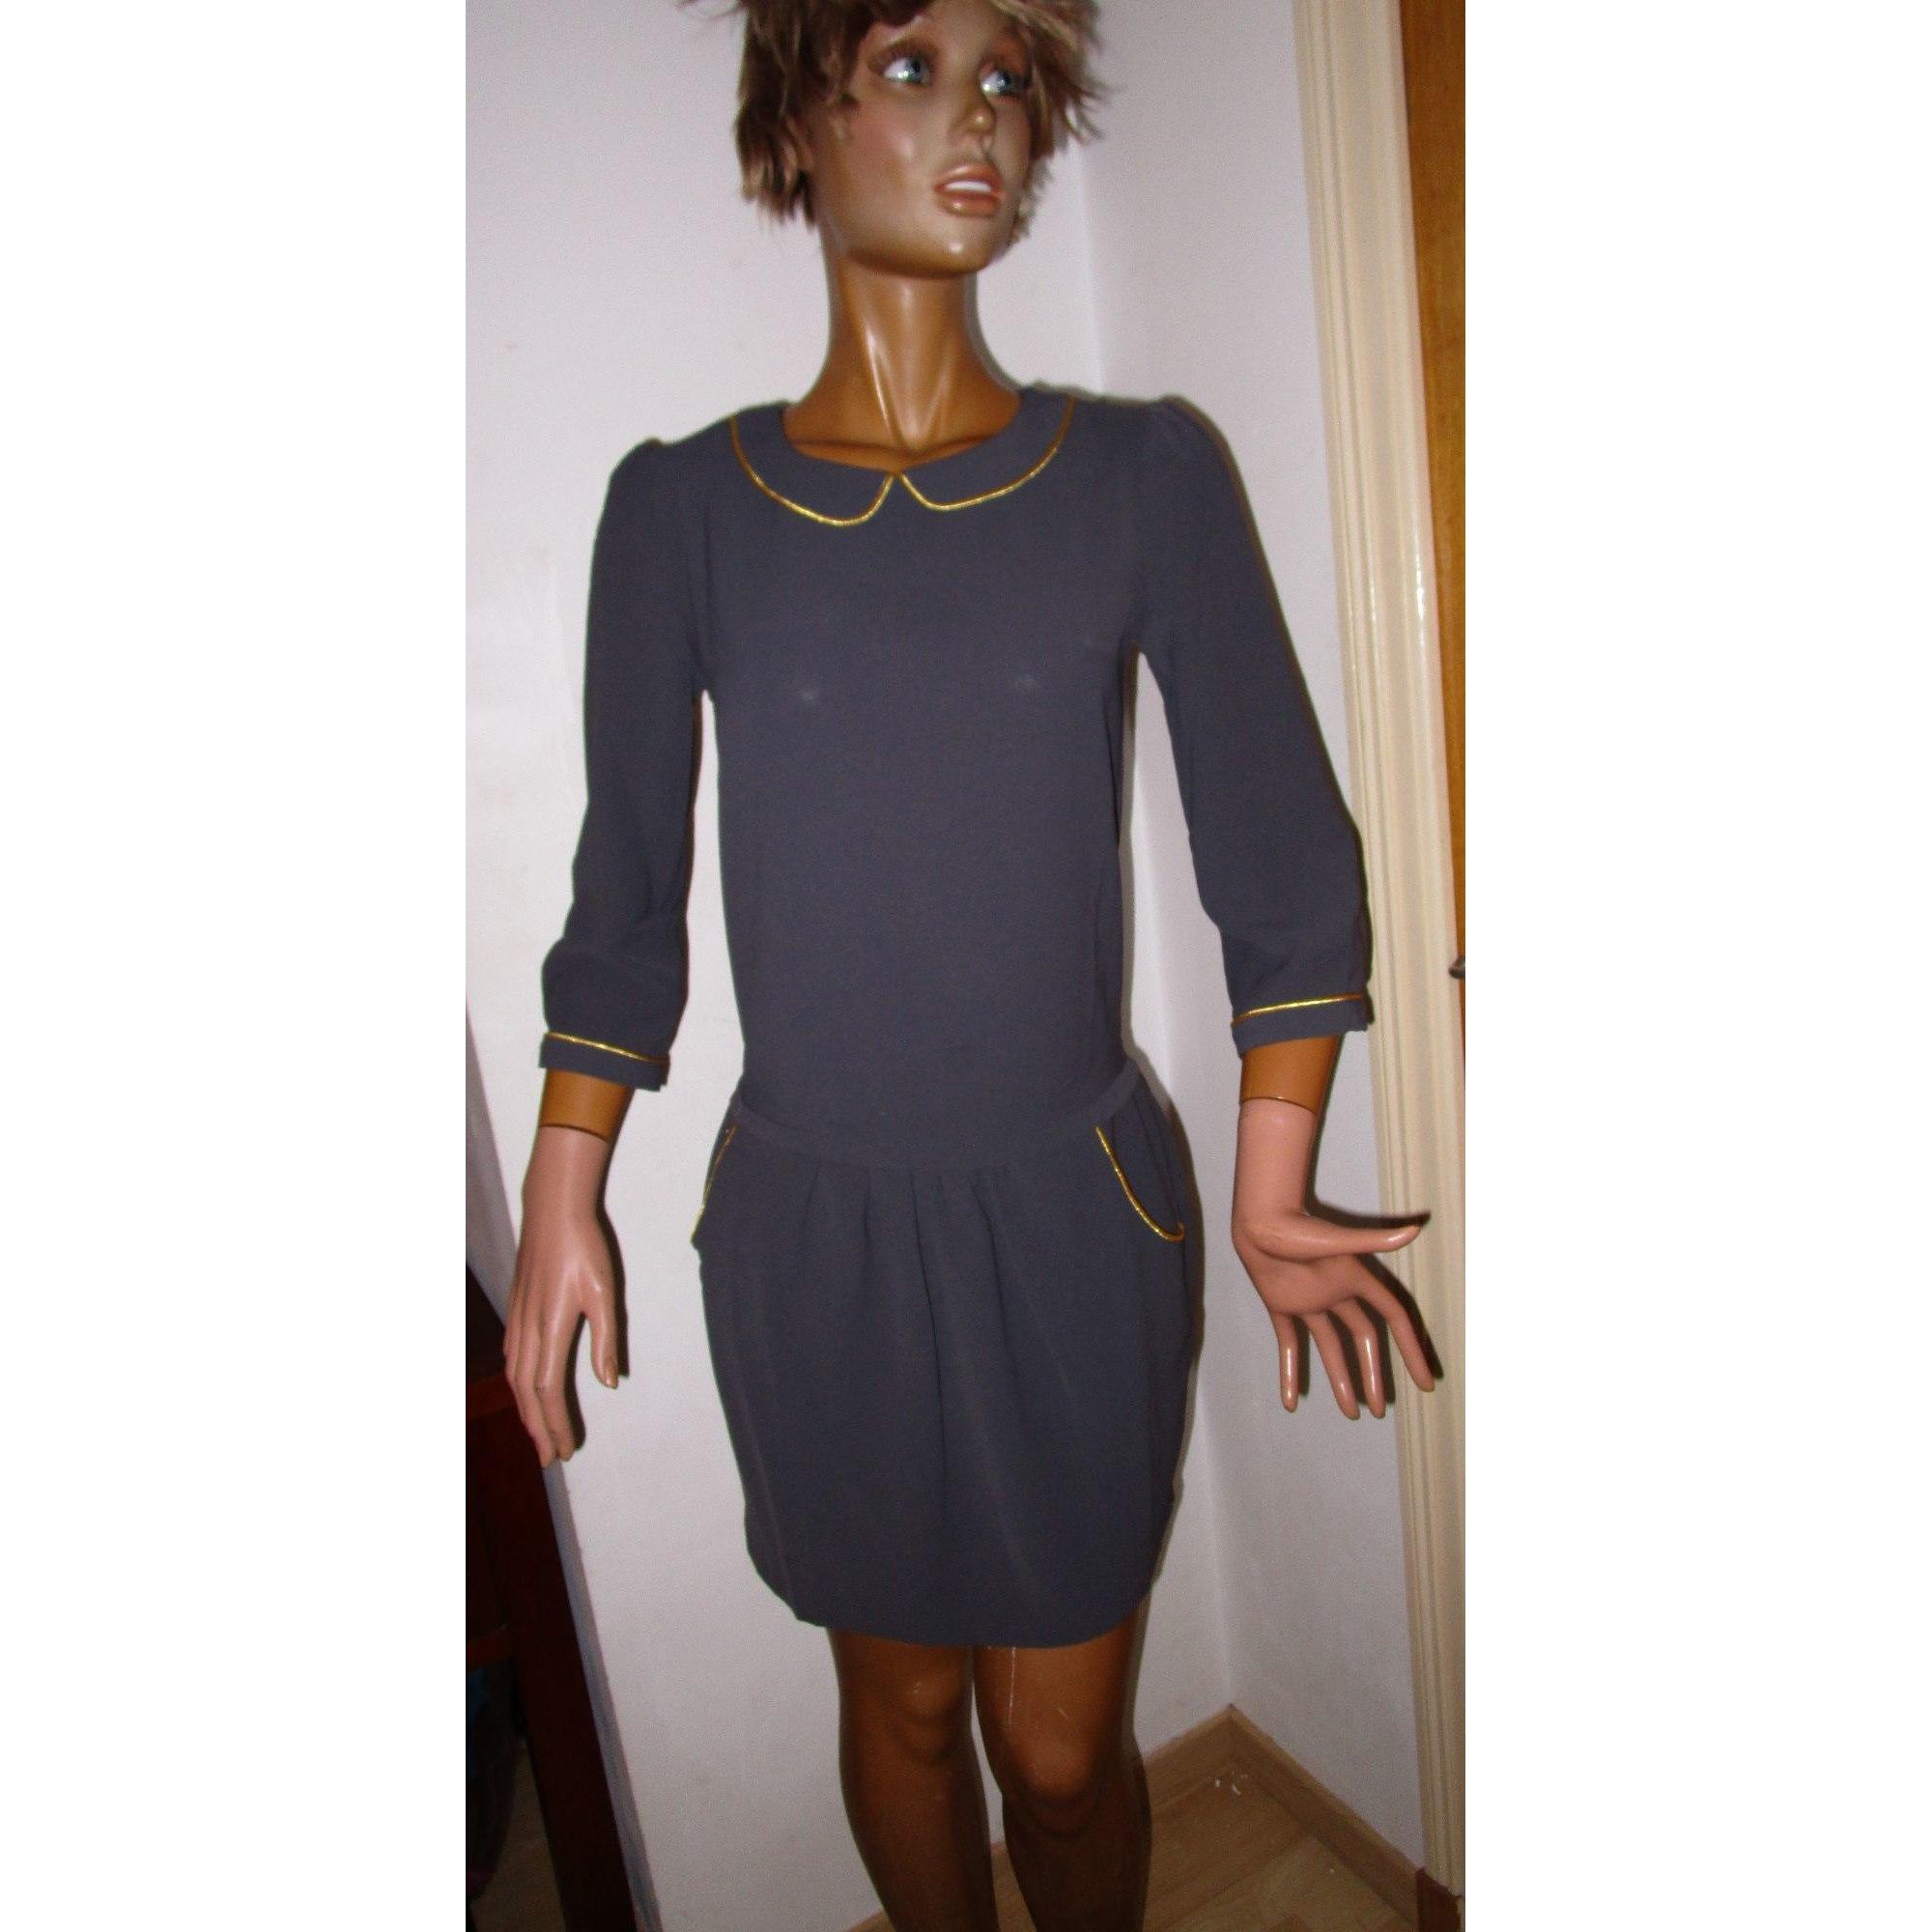 Robe Courte Mademoiselle R 34 Xs T0 Gris 8423095